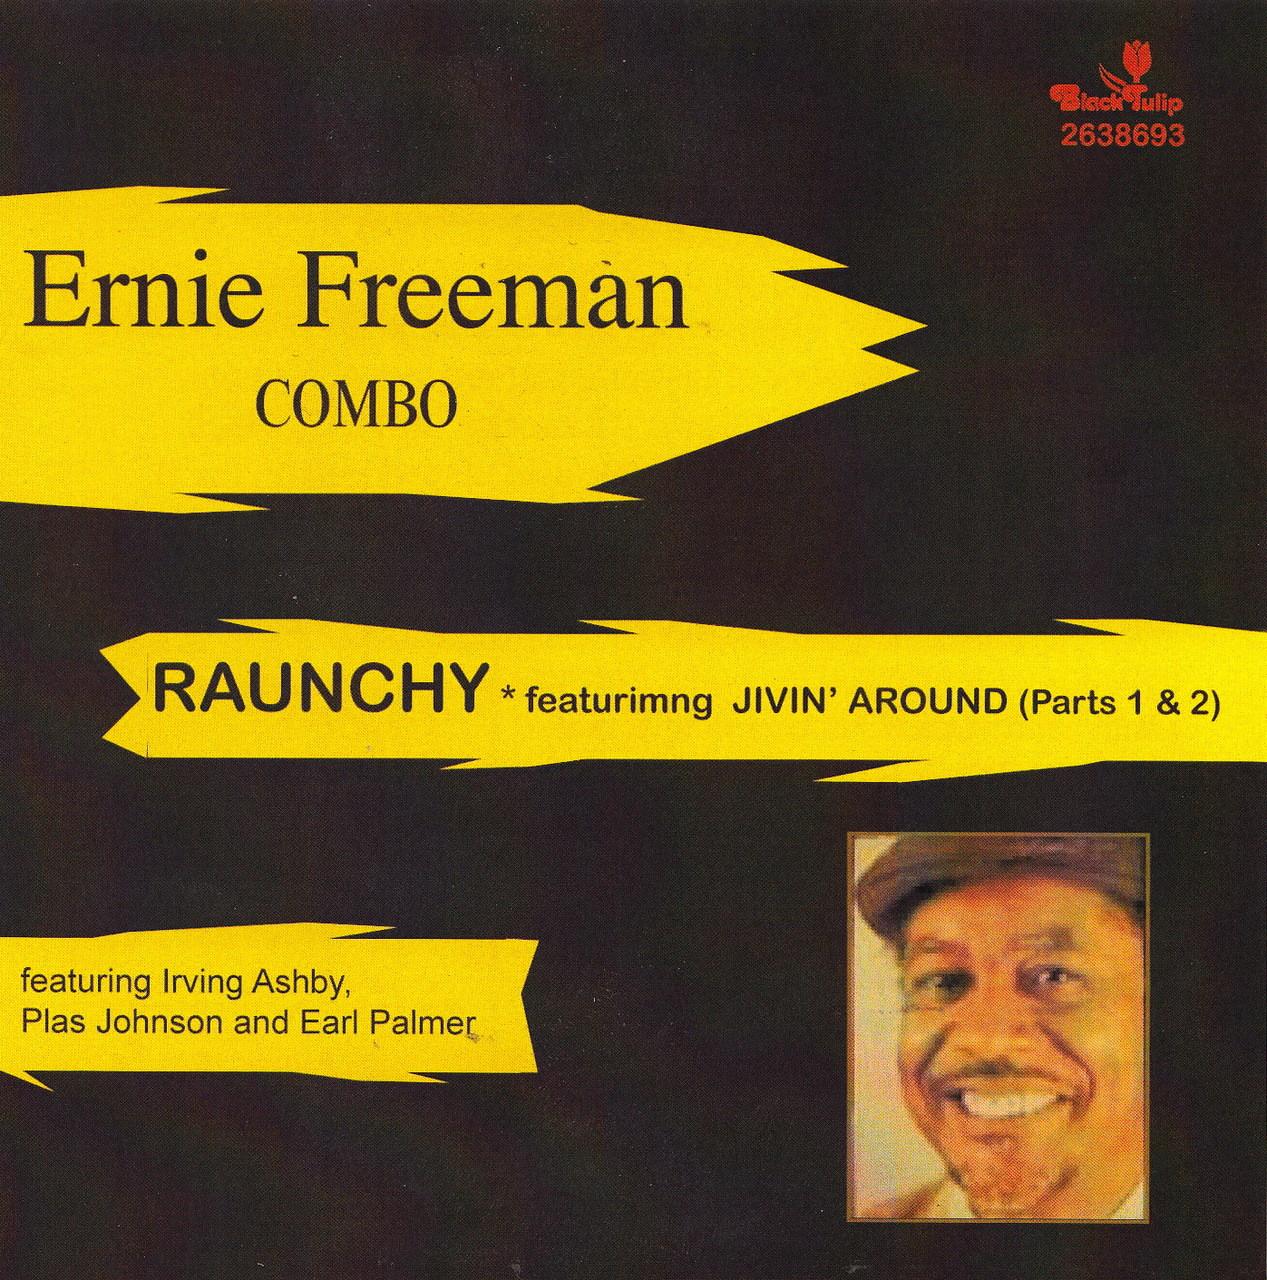 ERNIE FREEMAN COMBO - RAUNCHY (CD) - Norton Records